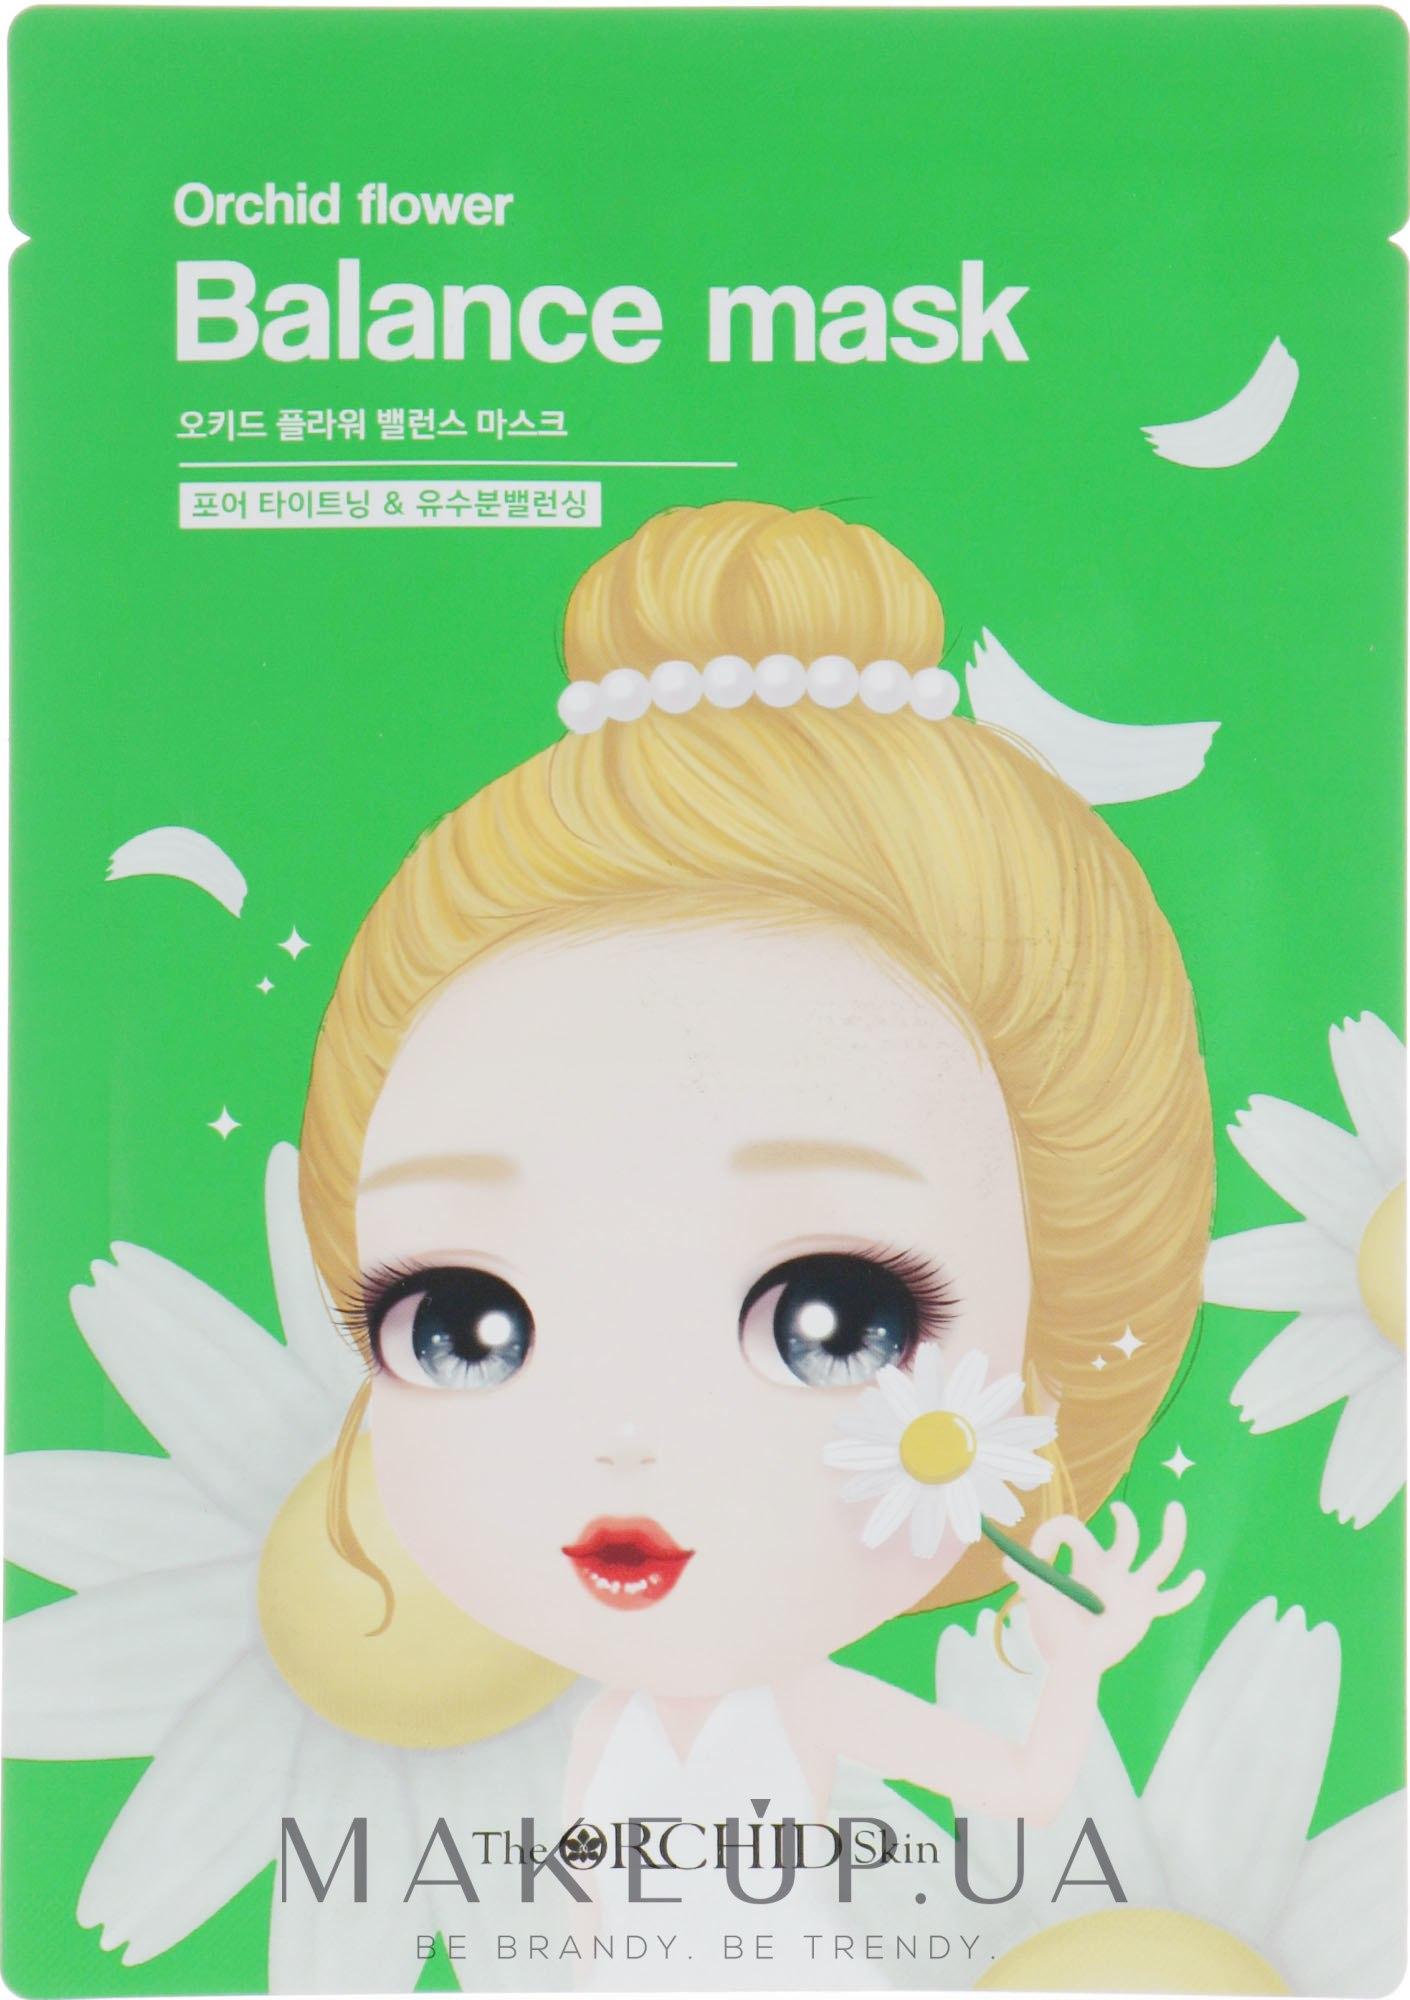 Тканевая маска для лица, уменьшающая воспаления - The Orchid Skin Orchid Flower Balance Mask — фото 25g